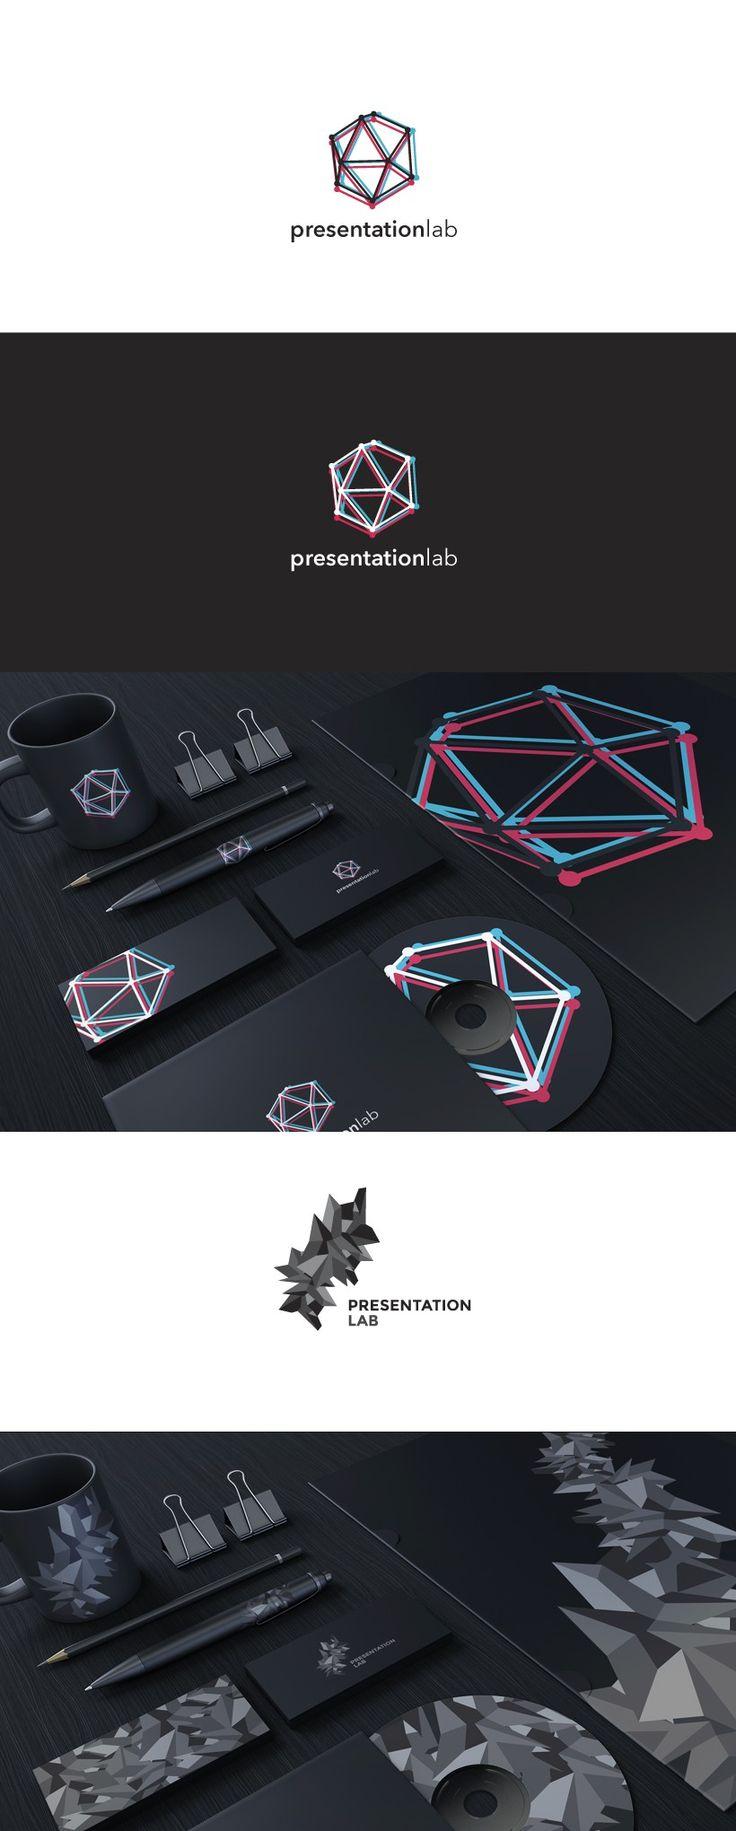 Presentation Lab identity by Merixstudio